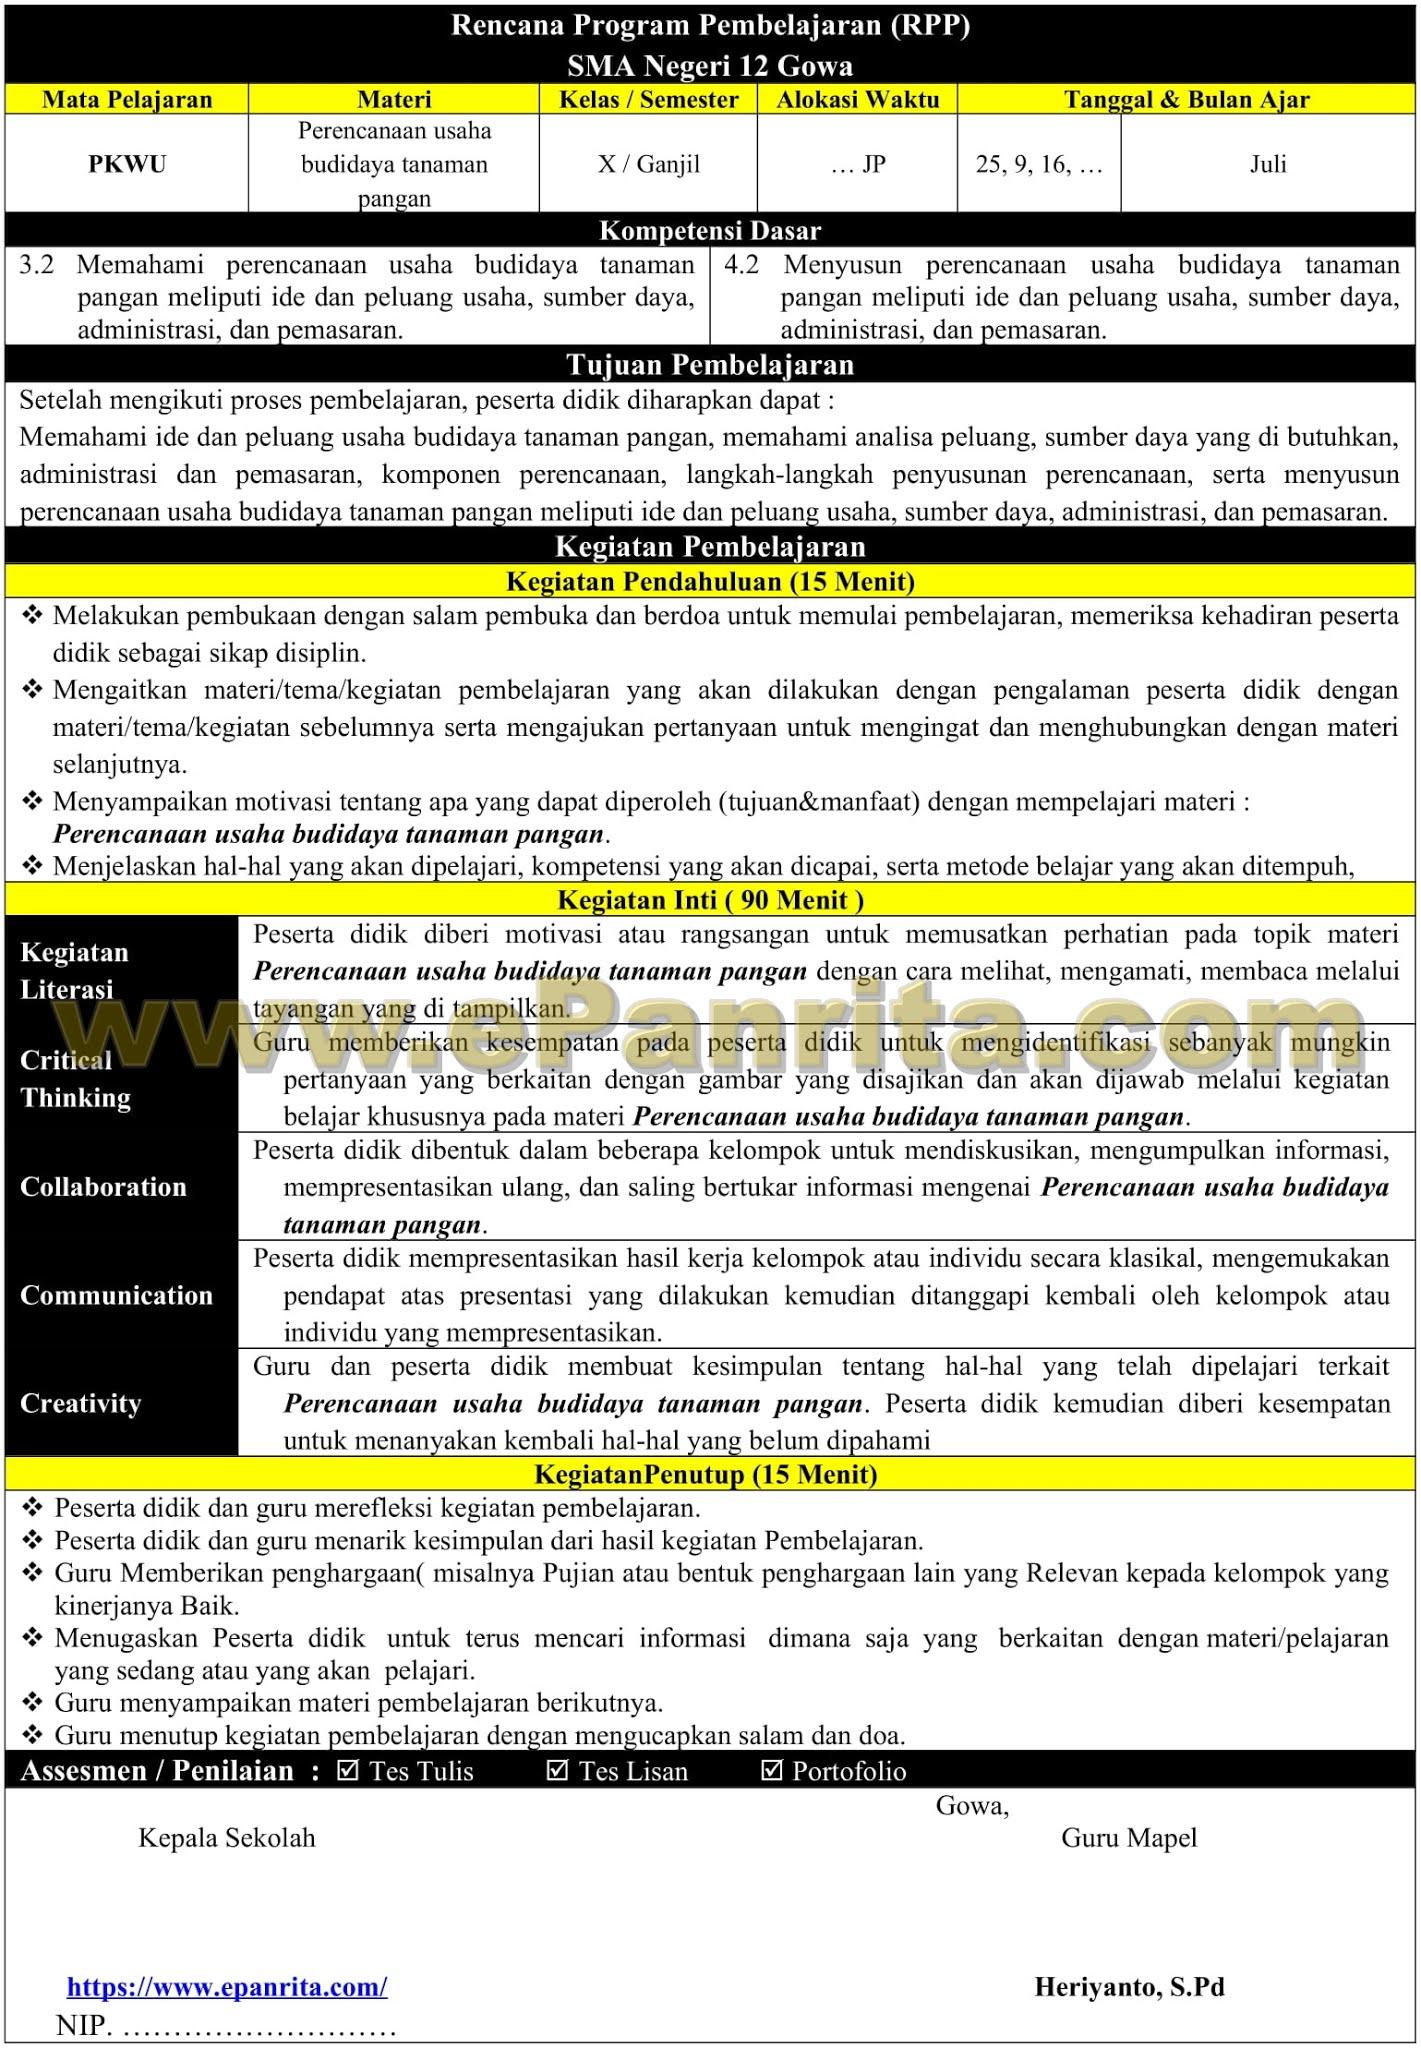 RPP 1 Halaman Prakarya Aspek Budidaya (Perencanaan usaha budidaya tanaman pangan)